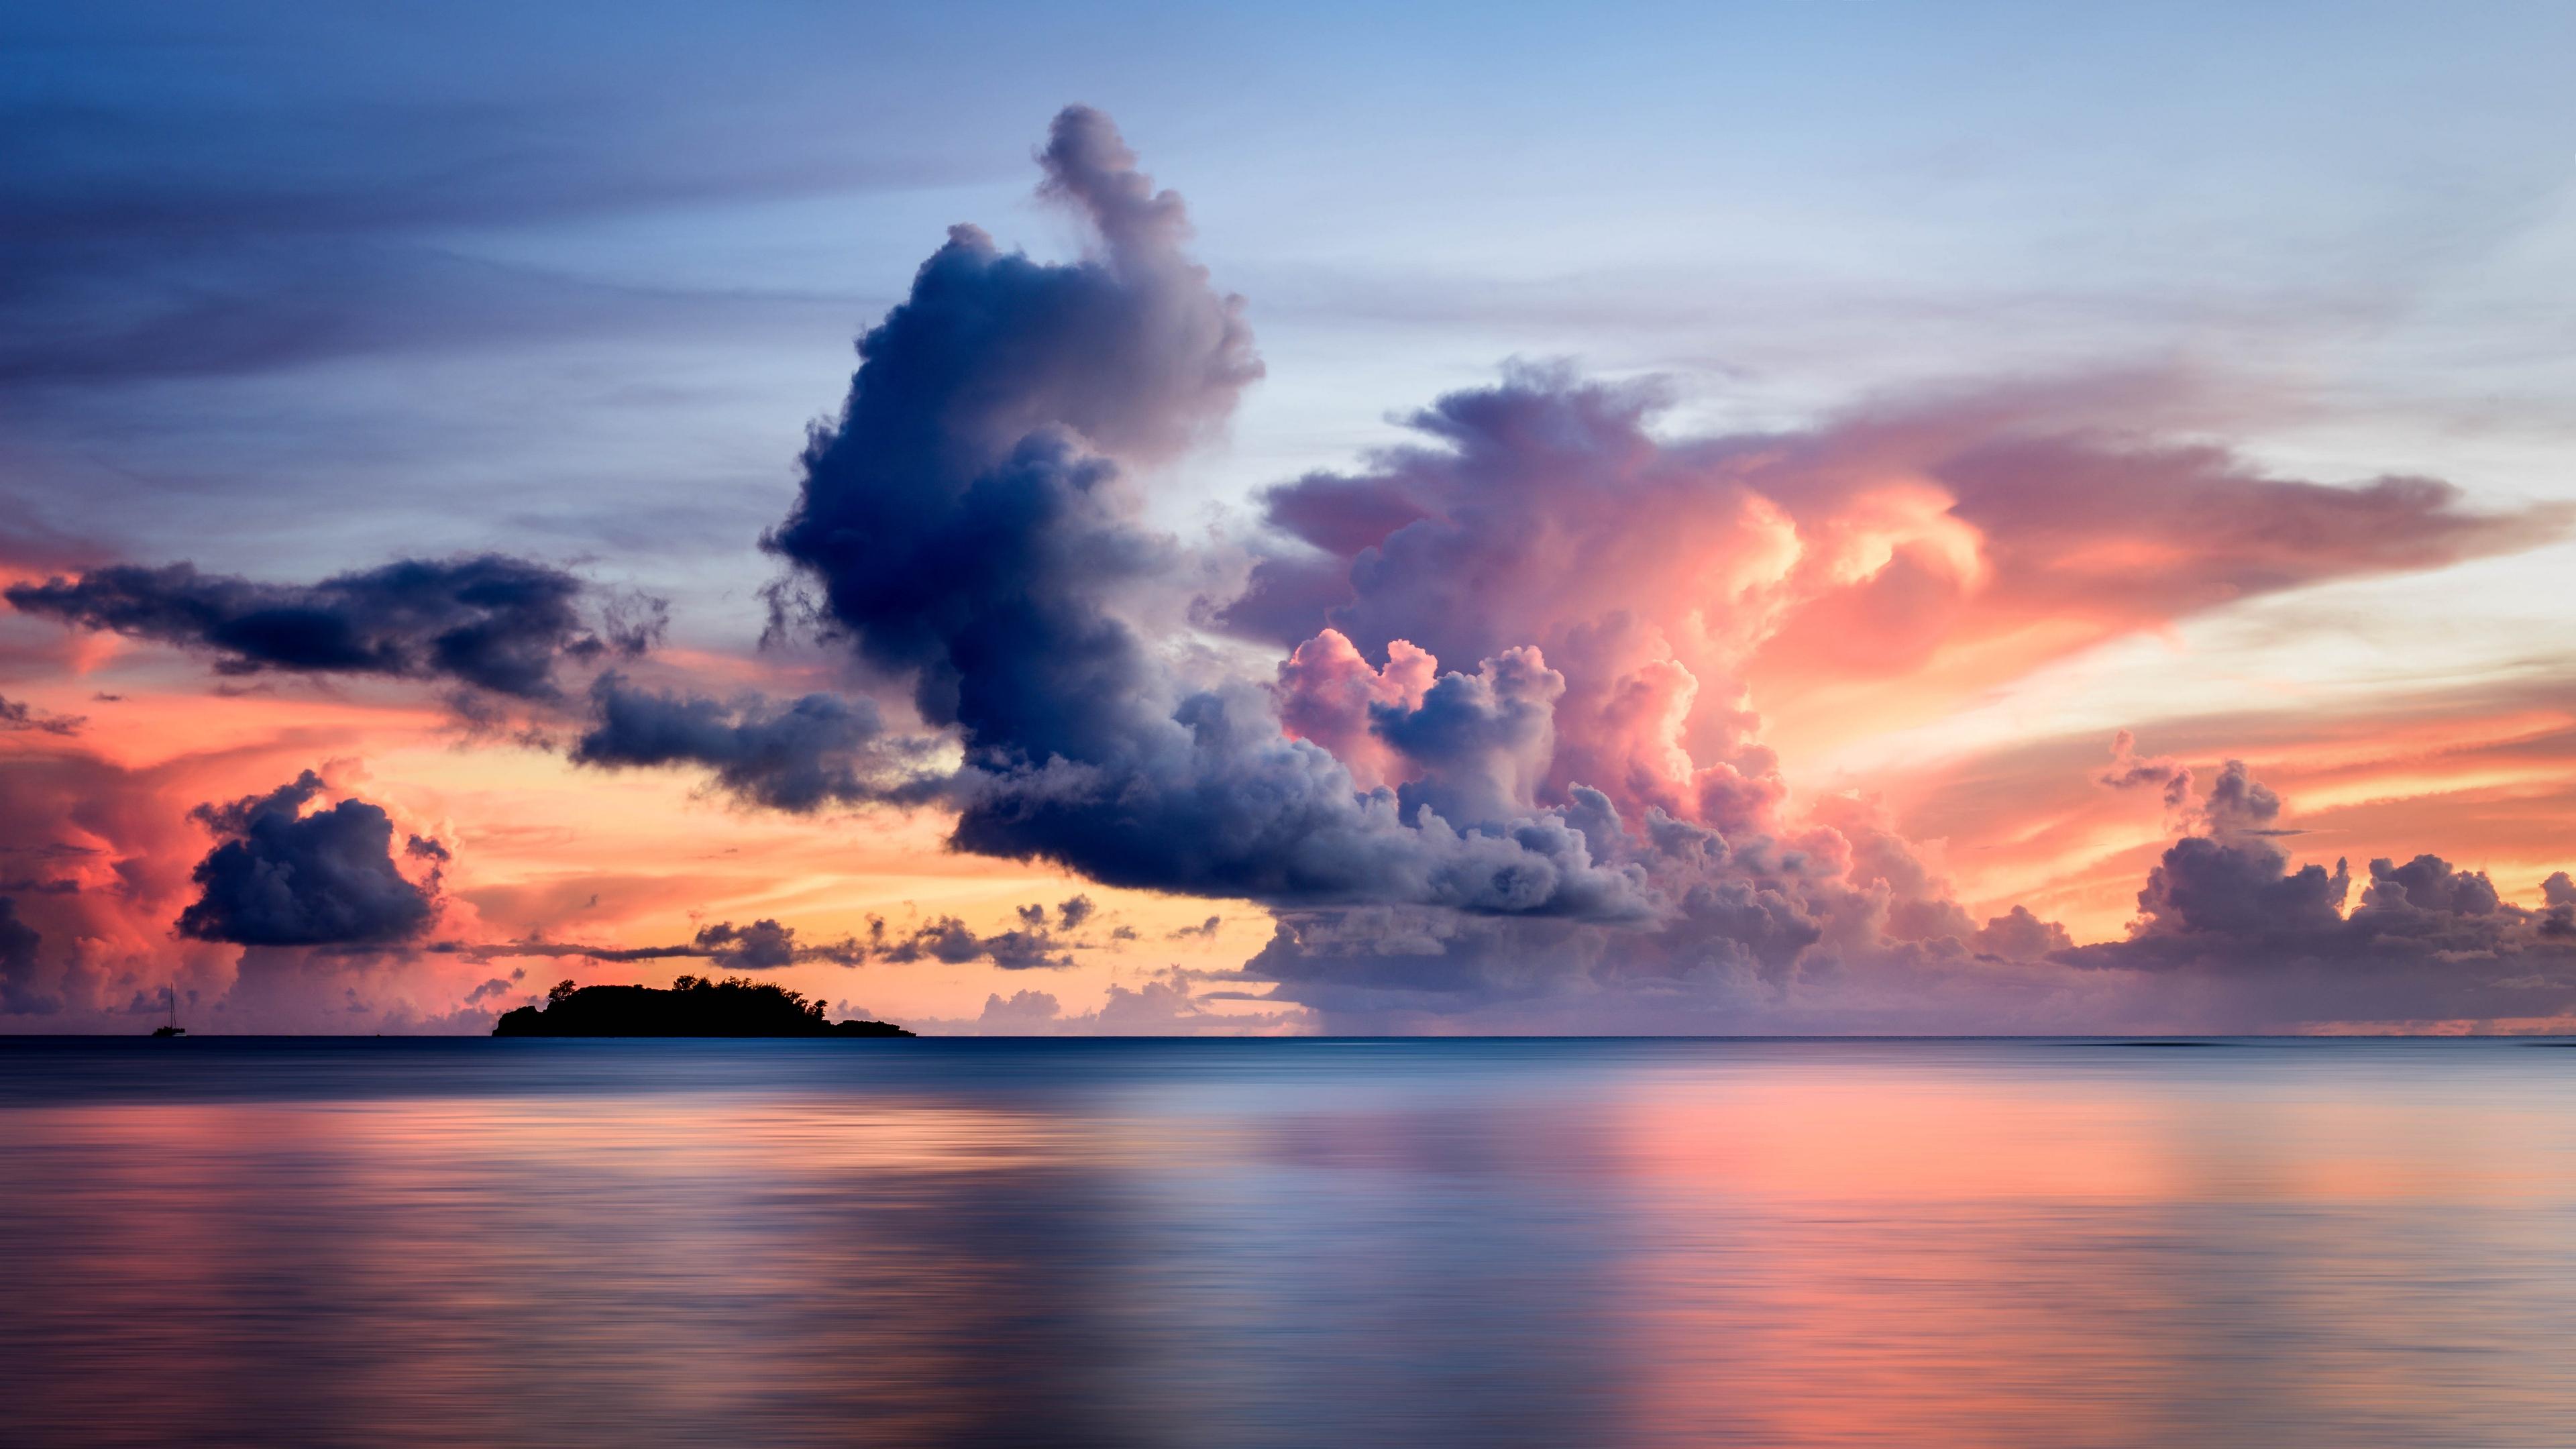 sea clouds horizon island sky sunset 4k 1541117907 - sea, clouds, horizon, island, sky, sunset 4k - Sea, Horizon, Clouds